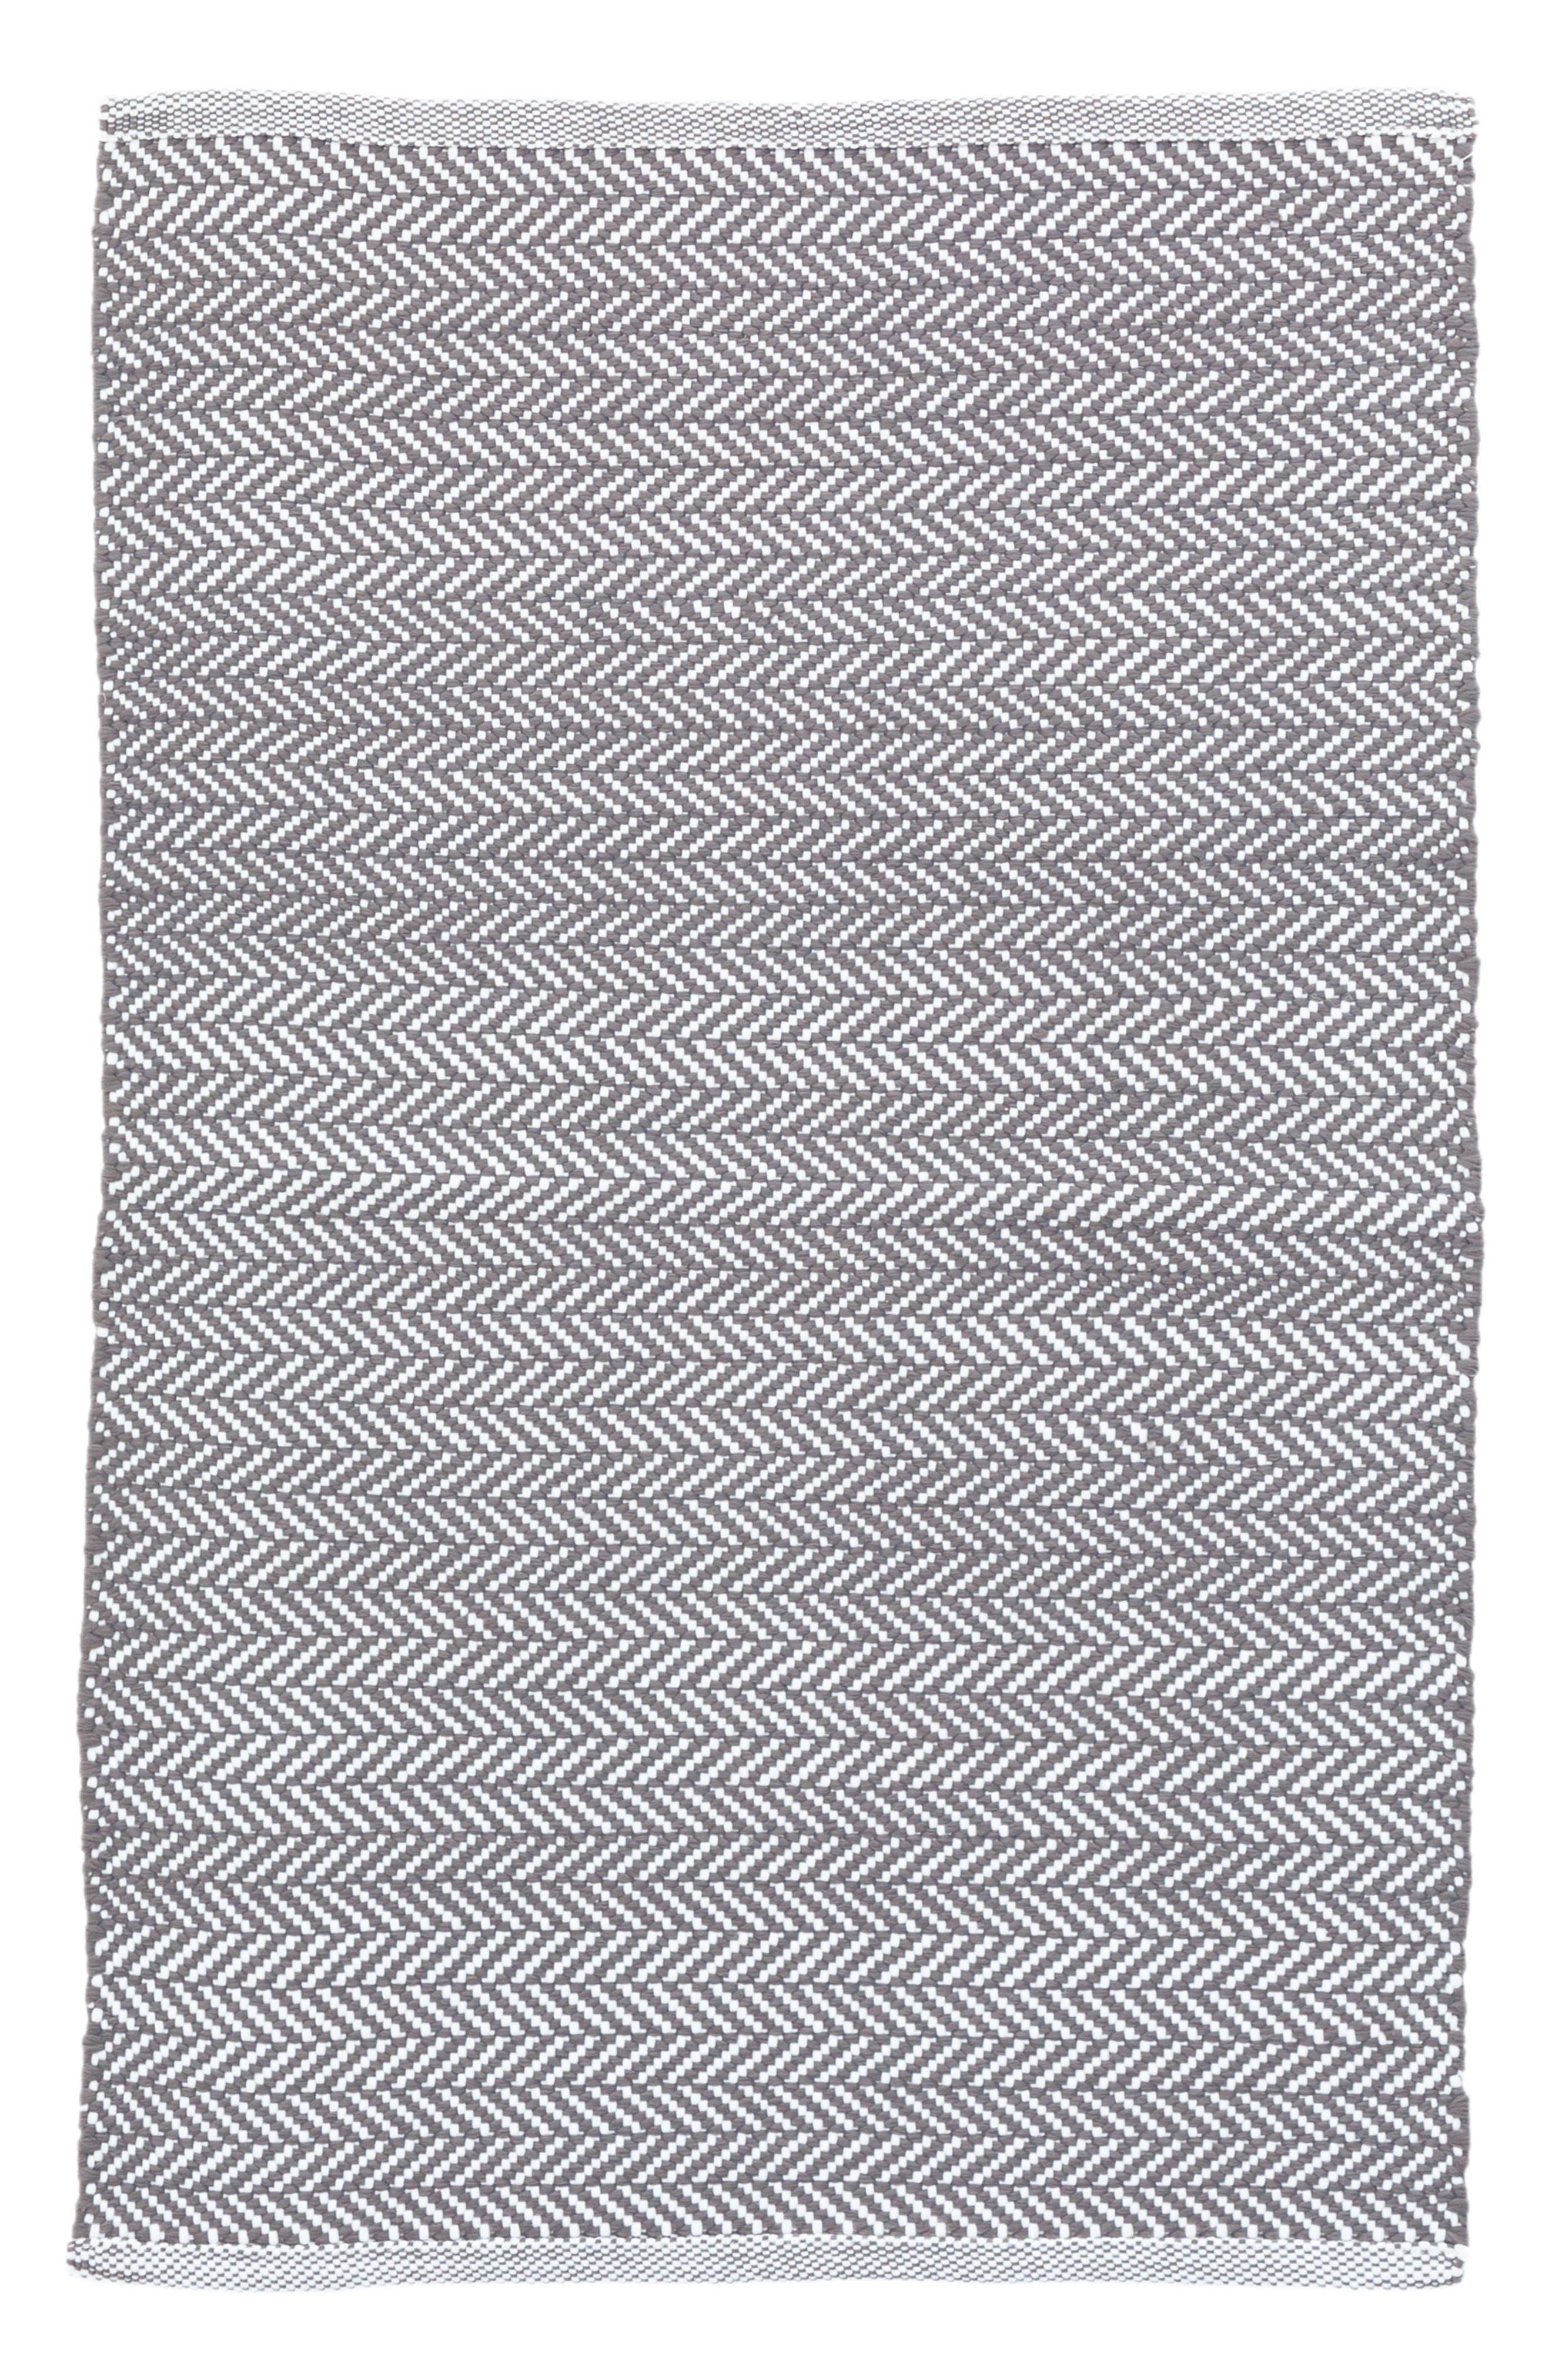 Herringbone Indoor/Outdoor Rug,                             Main thumbnail 1, color,                             GREY